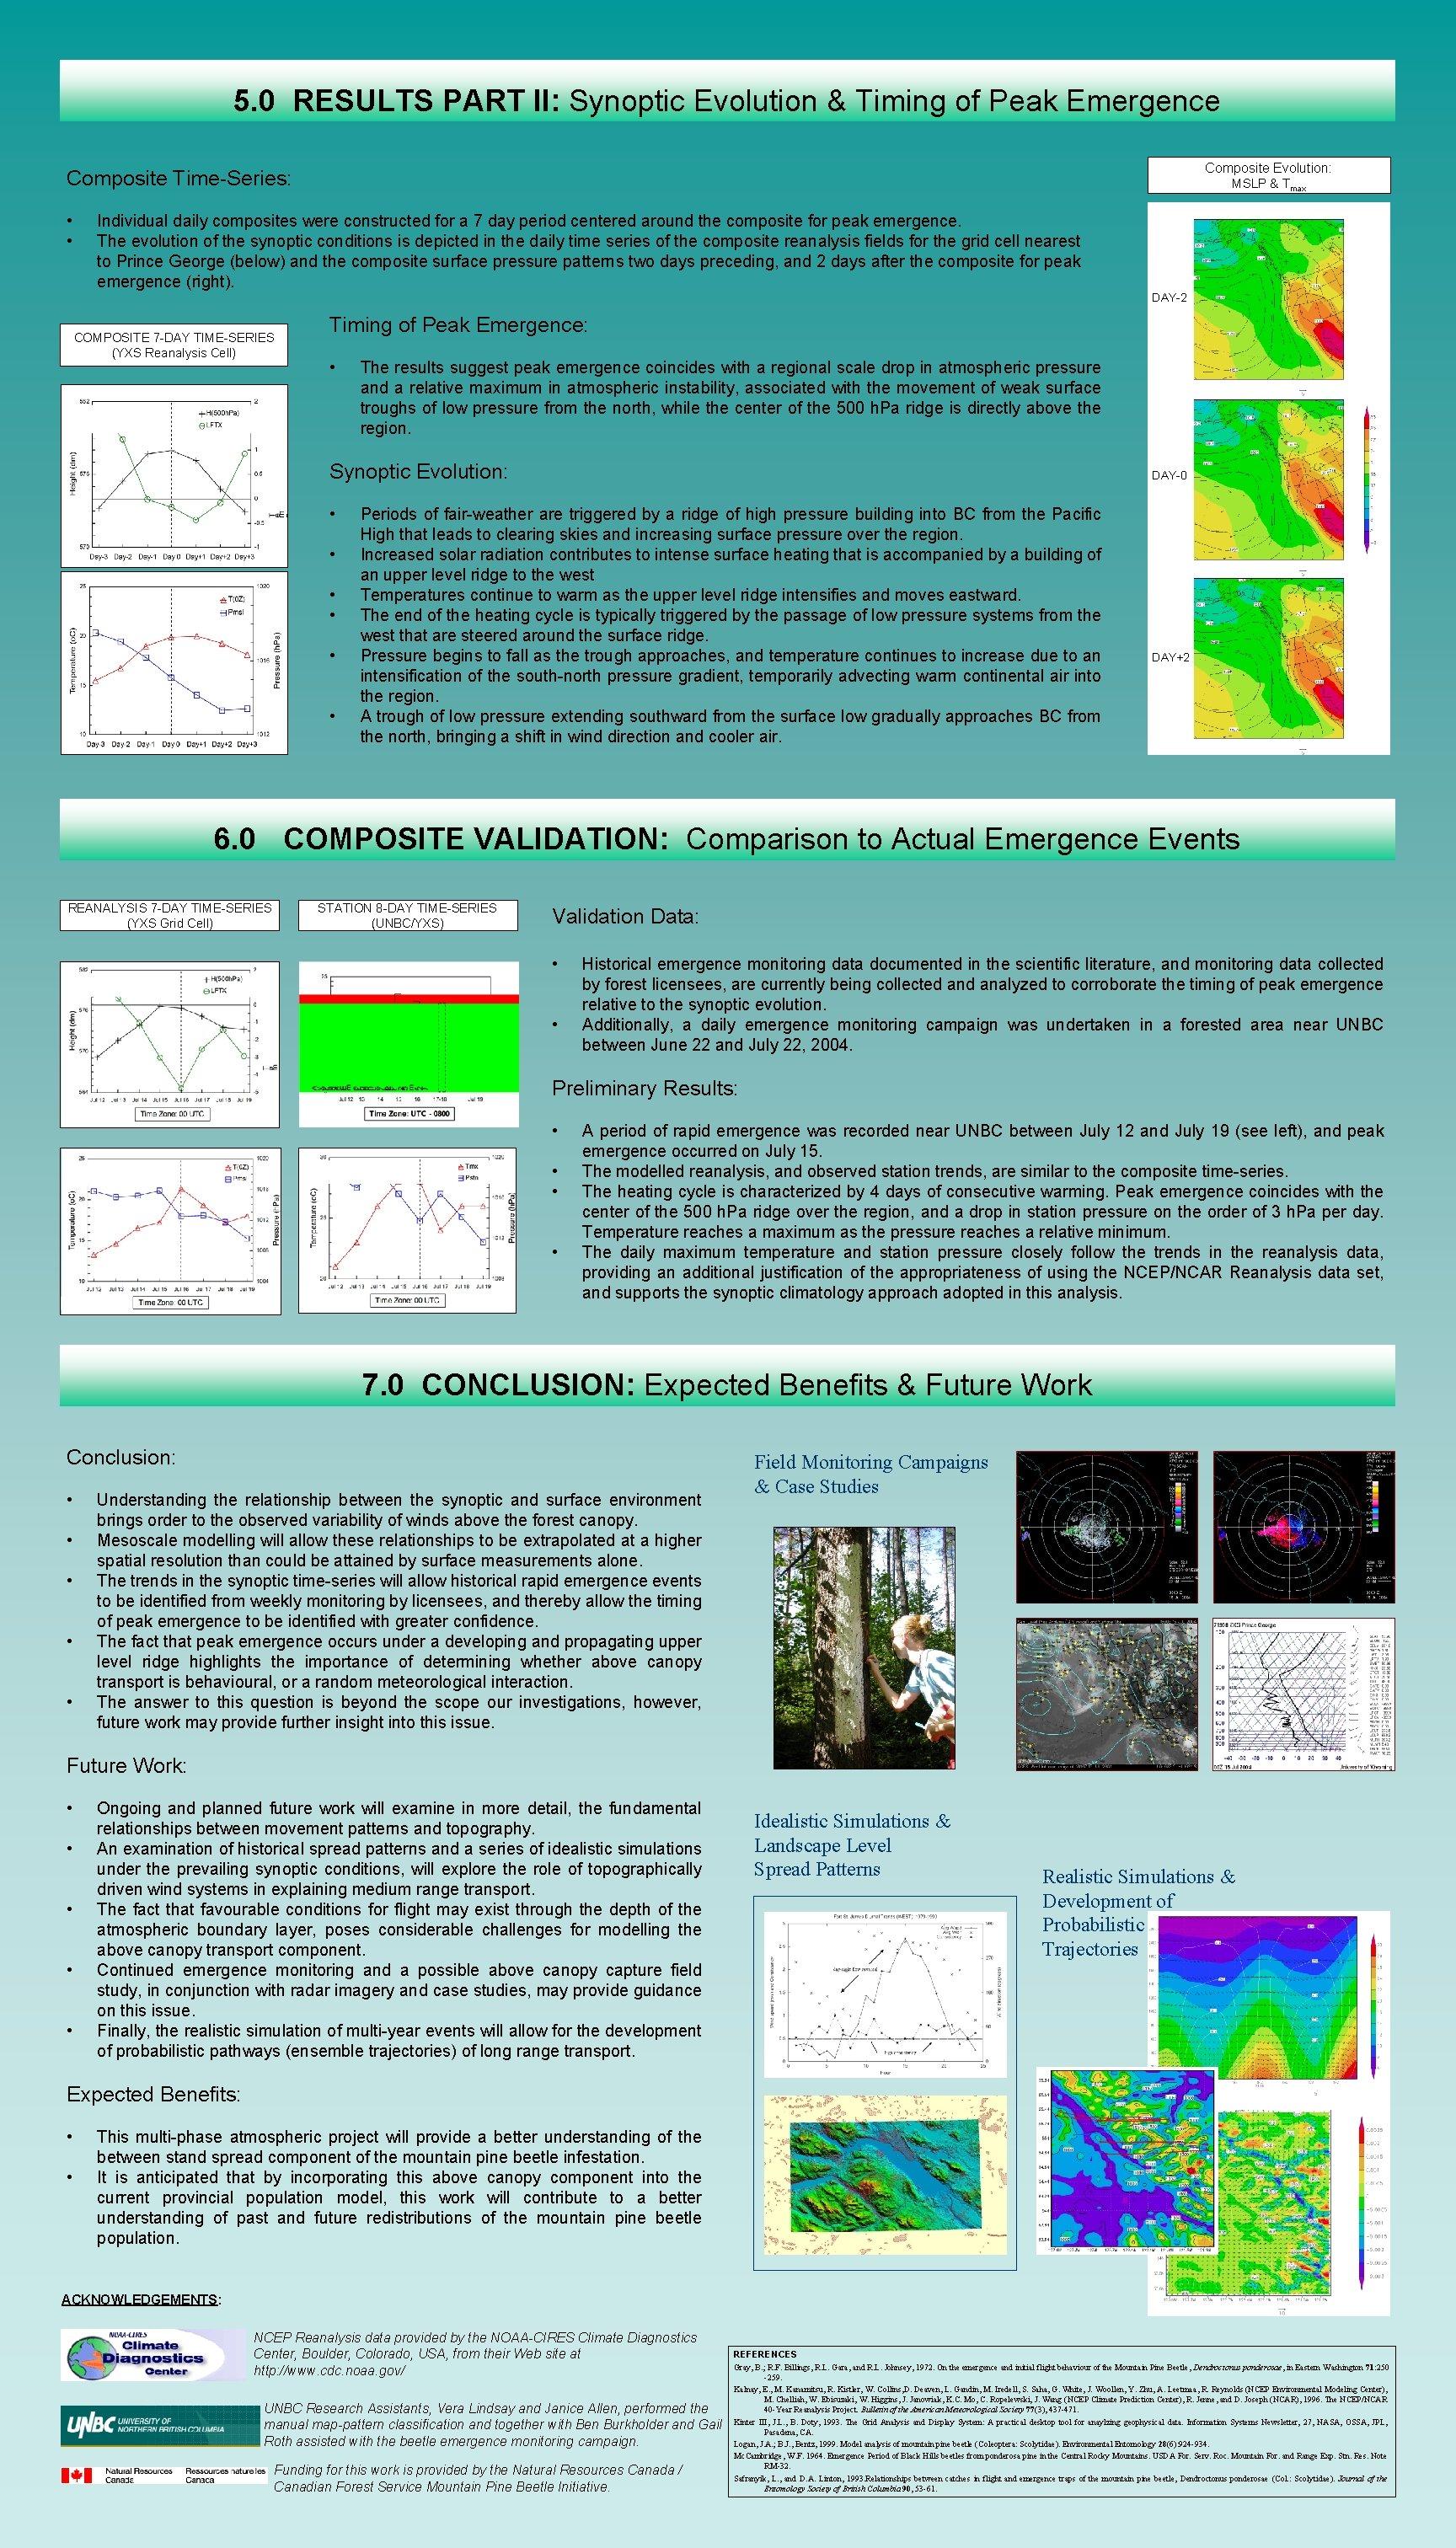 5. 0 RESULTS PART II: Synoptic Evolution & Timing of Peak Emergence Composite Evolution: